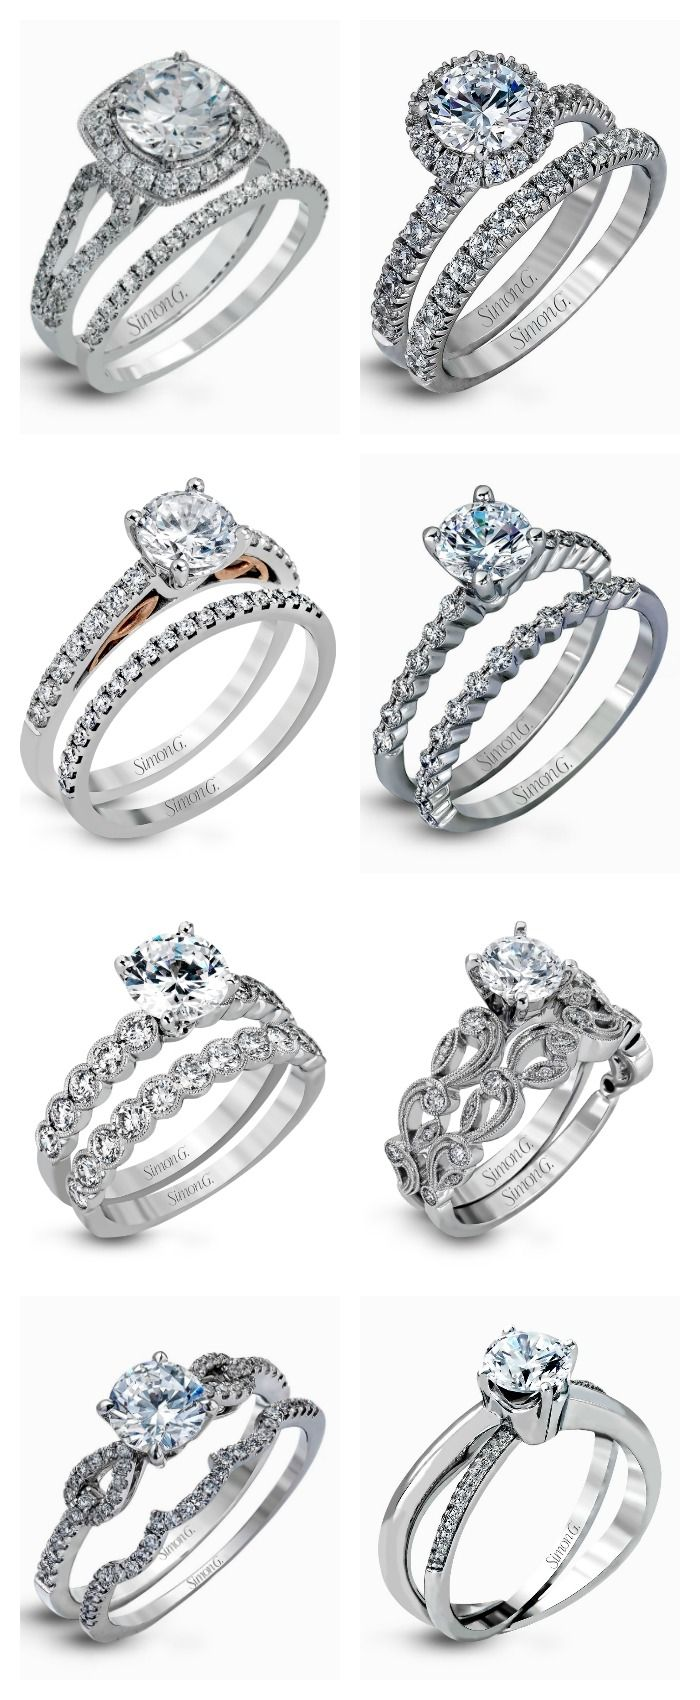 Bespoken #wedding ring Sets by Simon G.